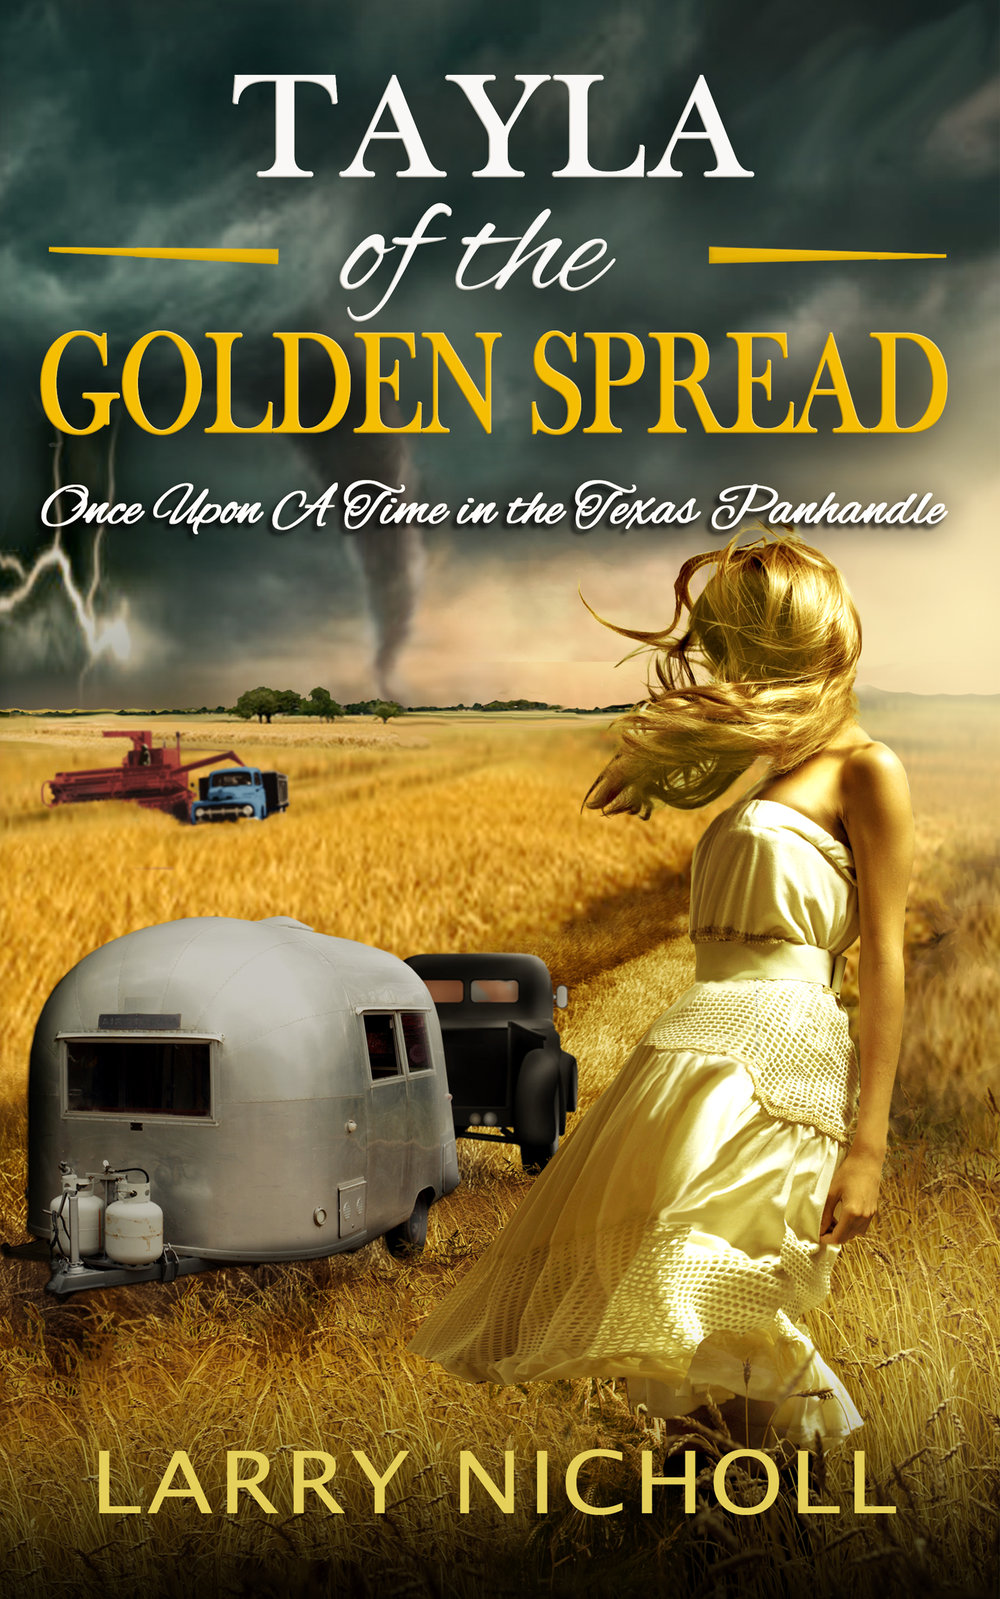 Larry_Nicholl_Tayla_of_the_Golden_Spread_final eBook_1563x2500_300dpi.jpg